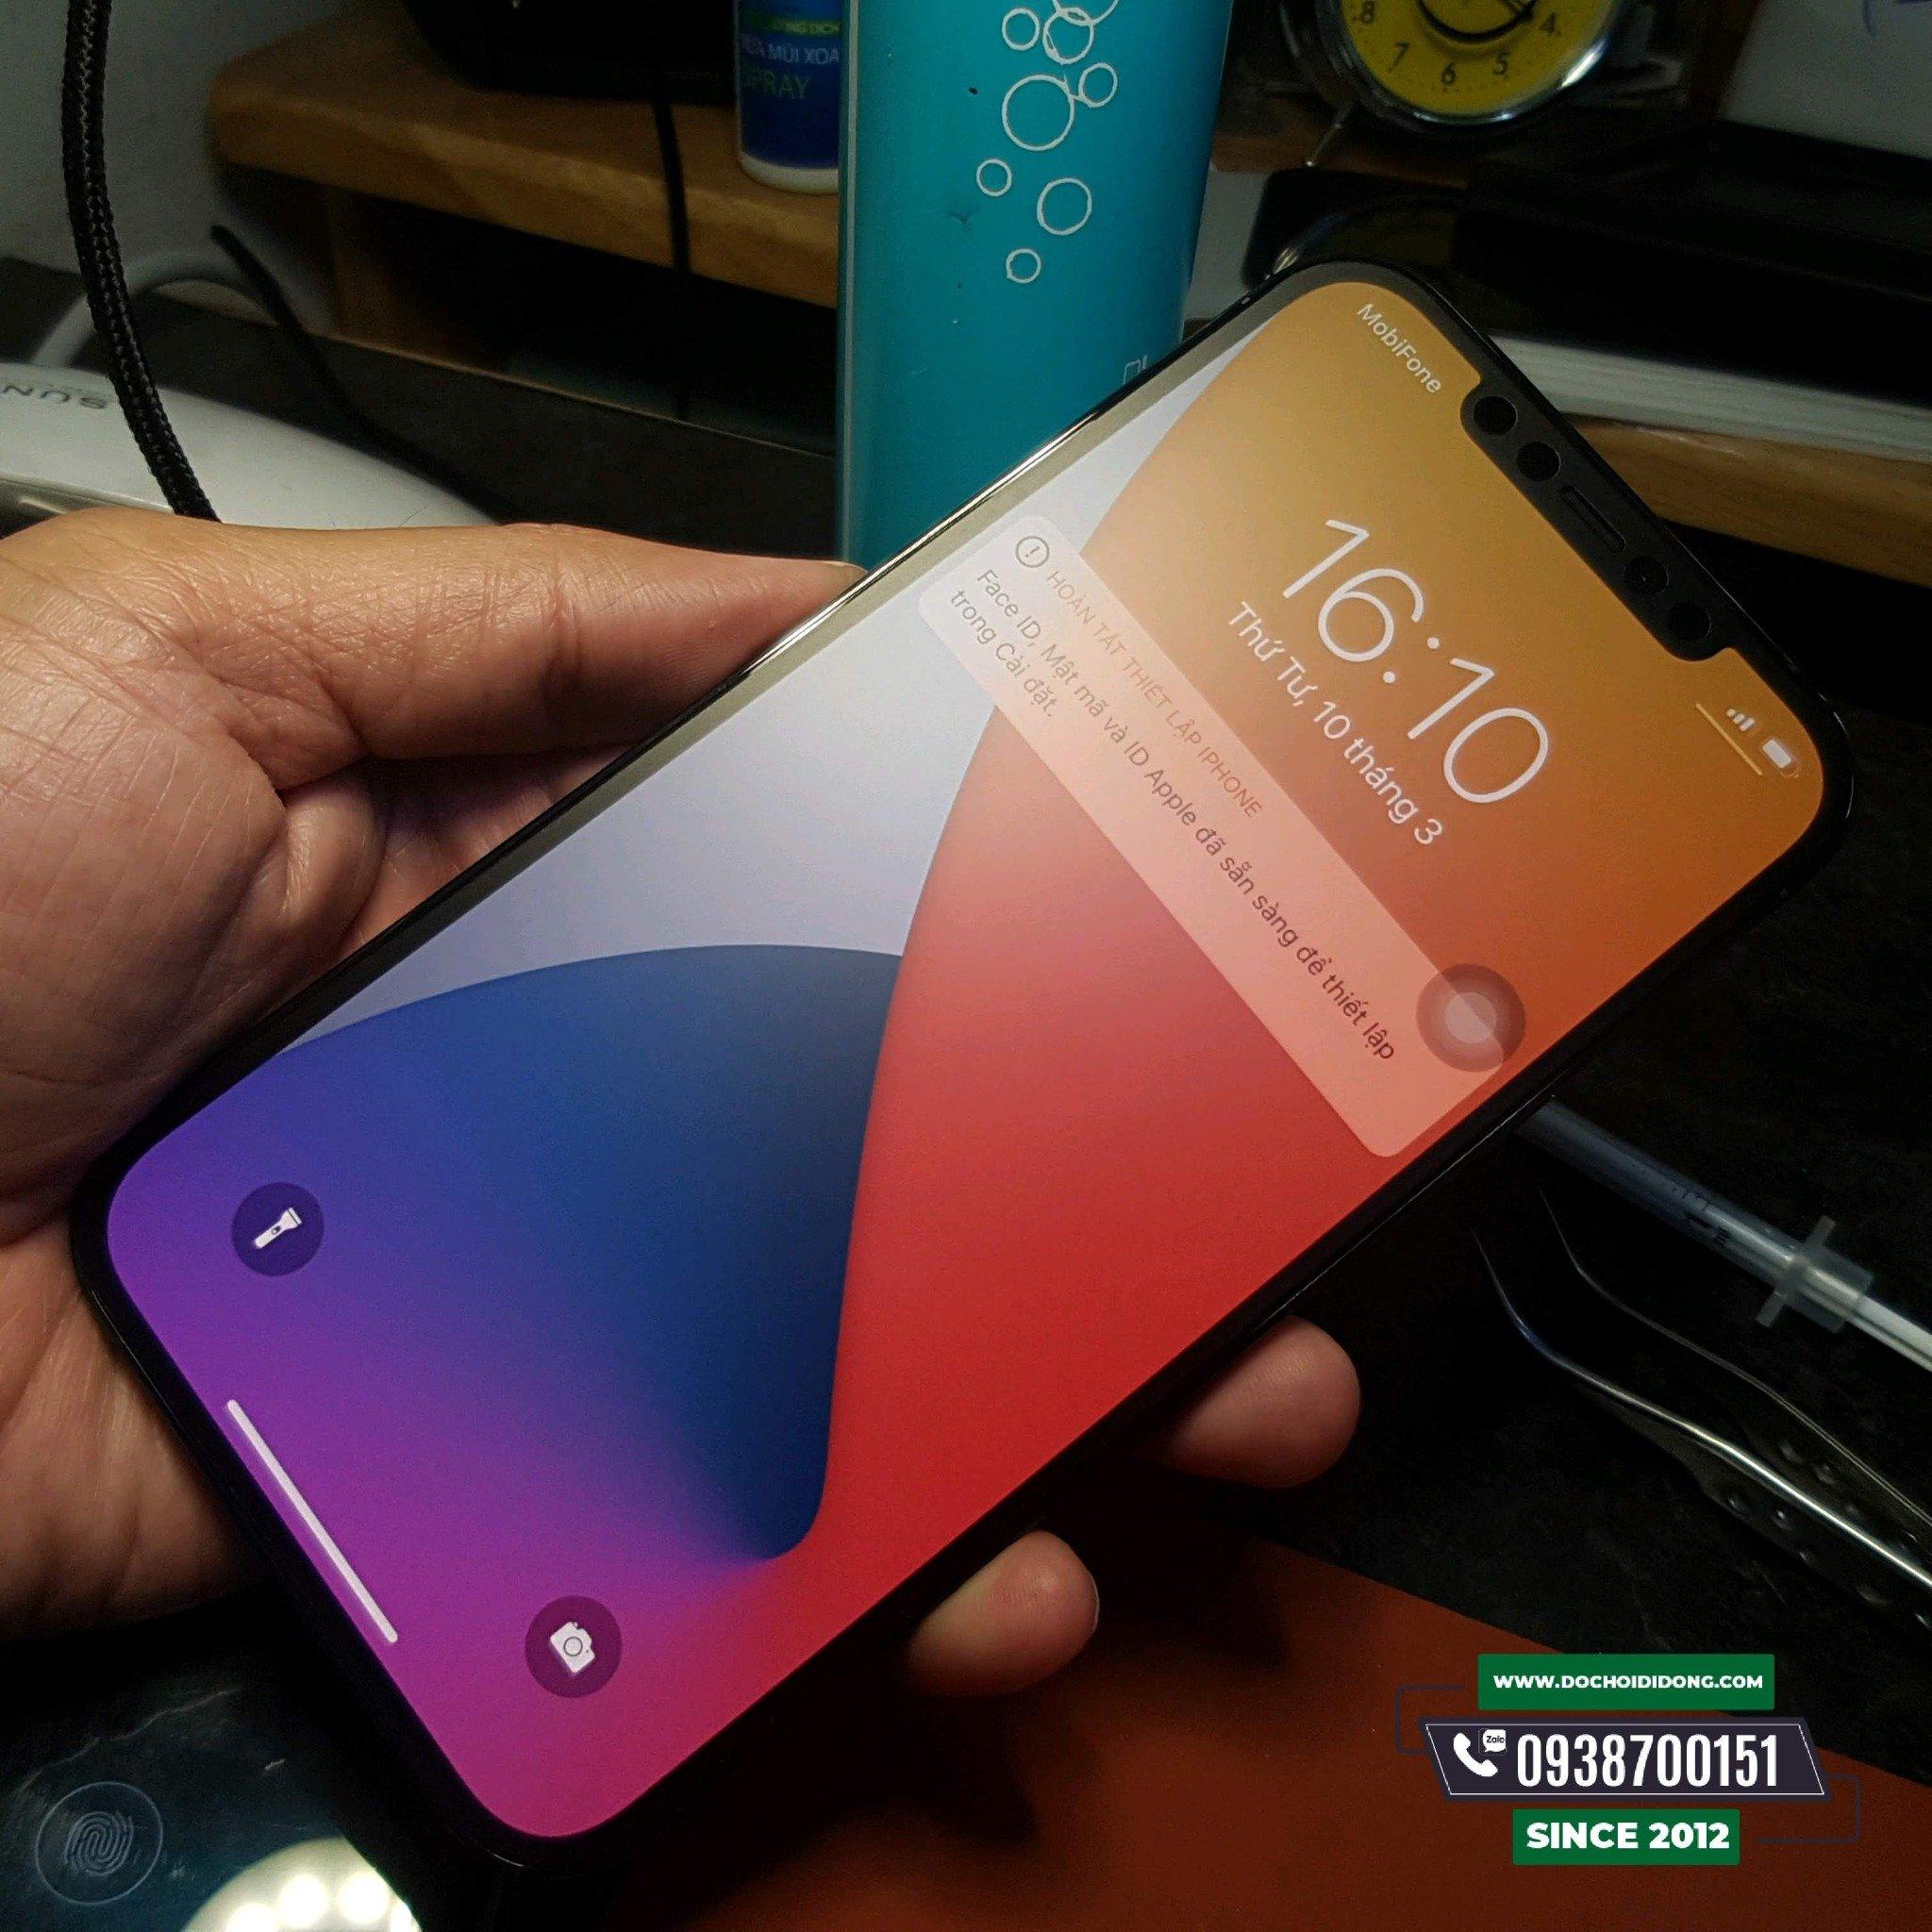 mieng-dan-ppf-iphone-12-pro-max-trong-nham-doi-mau-cao-cap